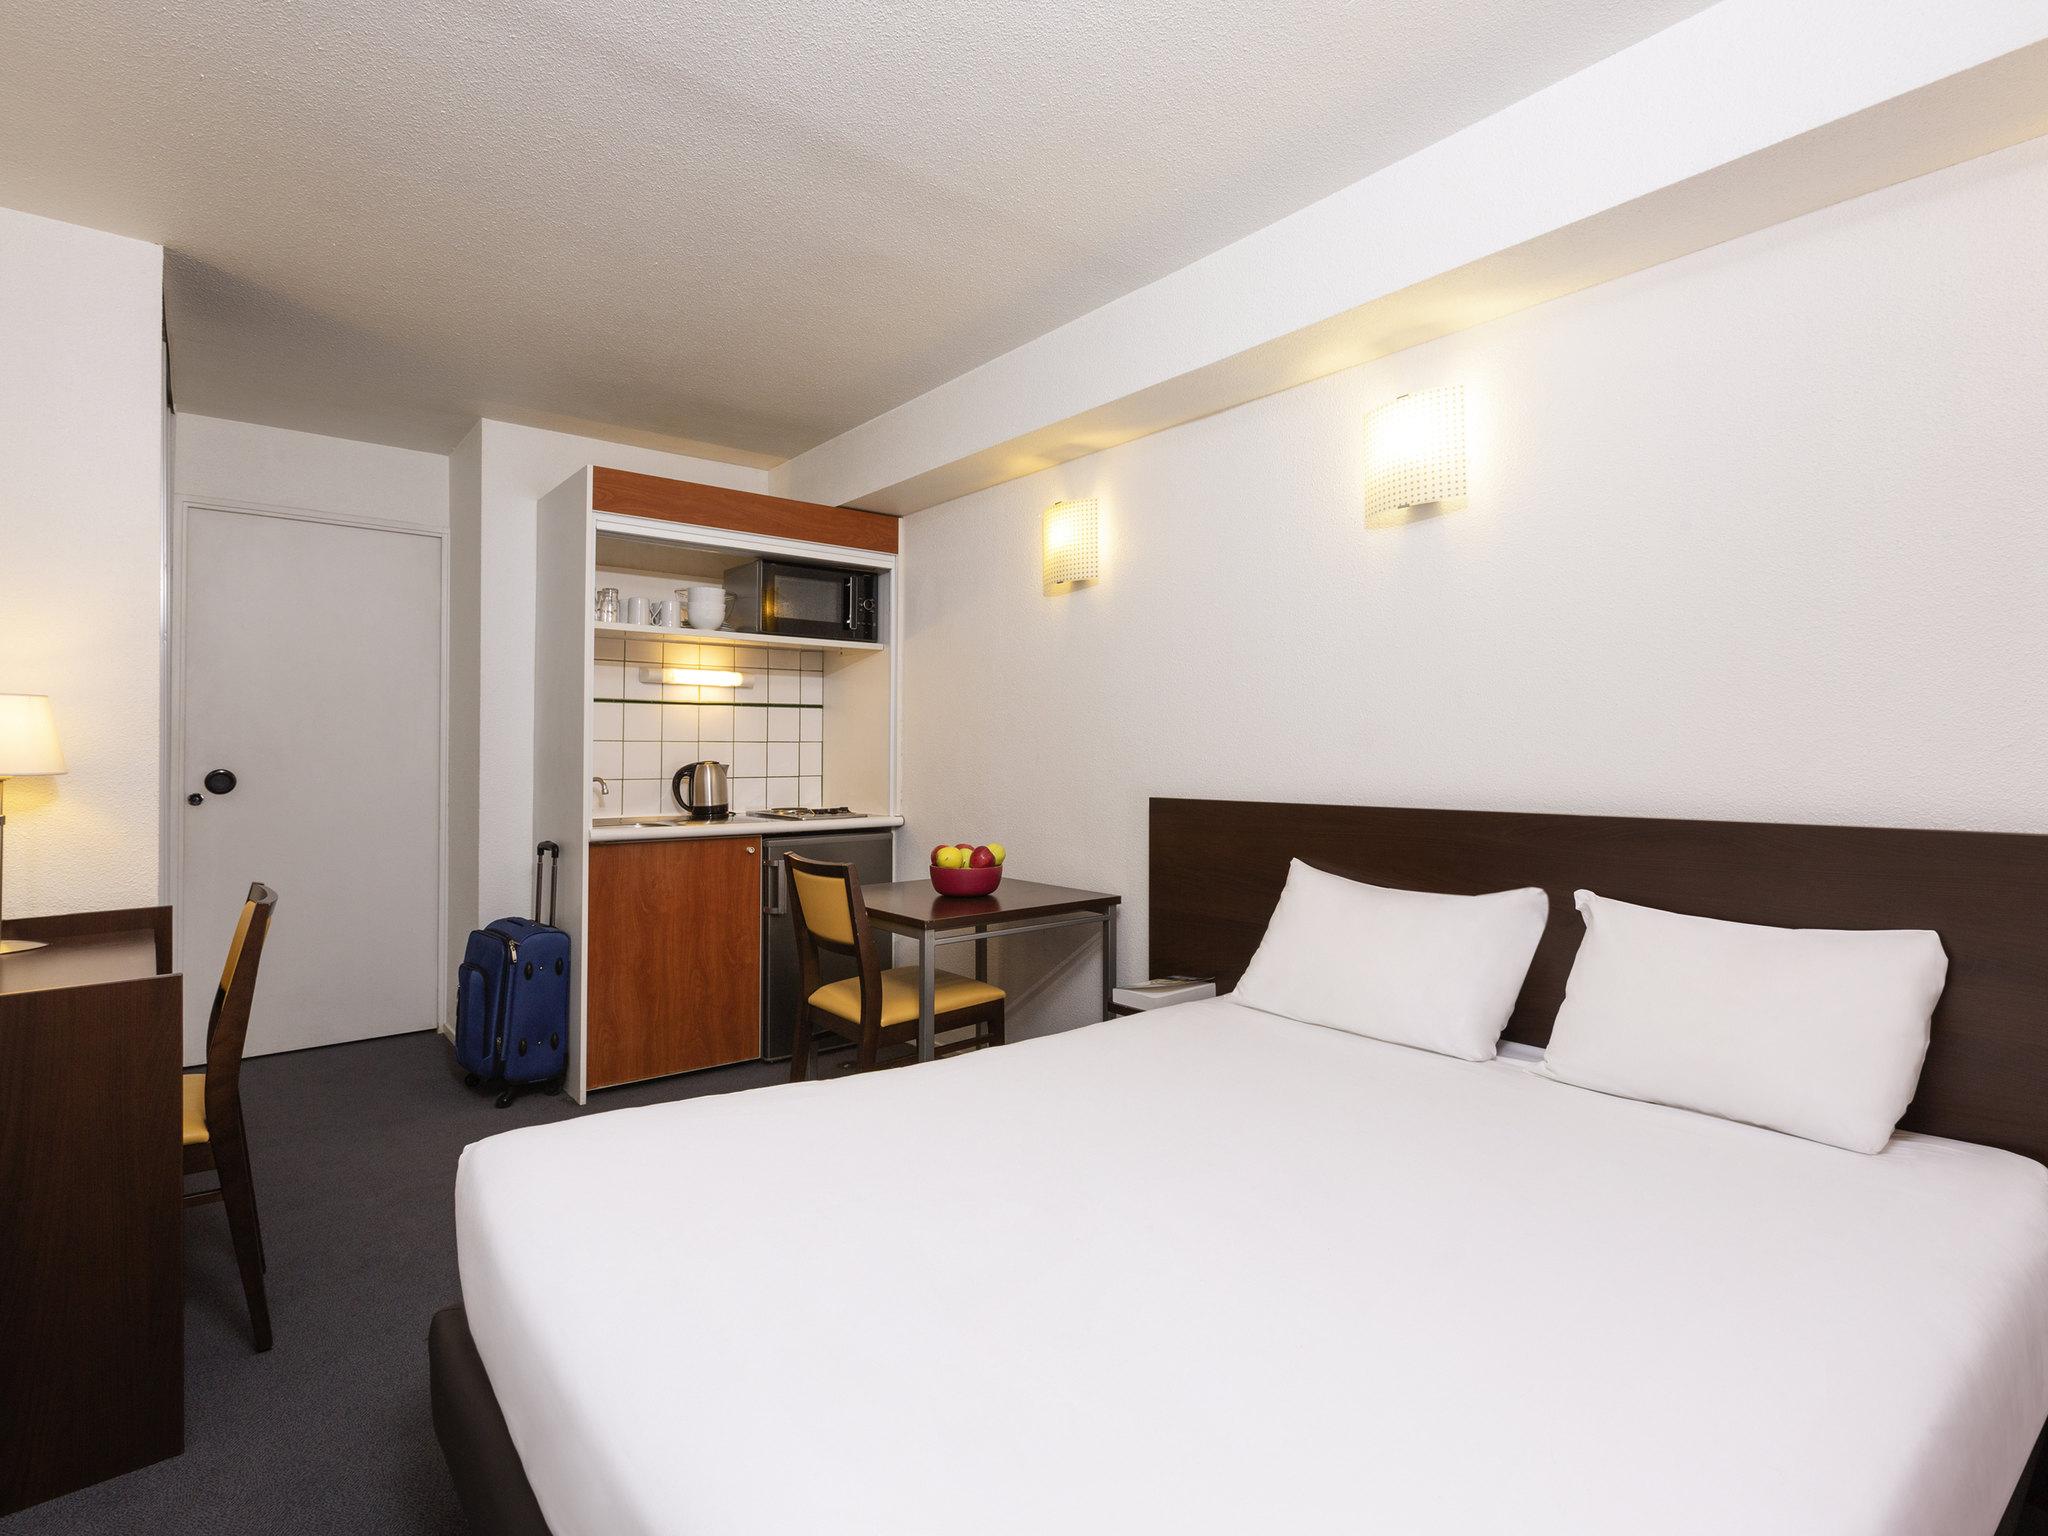 Hotel – Aparthotel Adagio access La Défense Léonard de Vinci